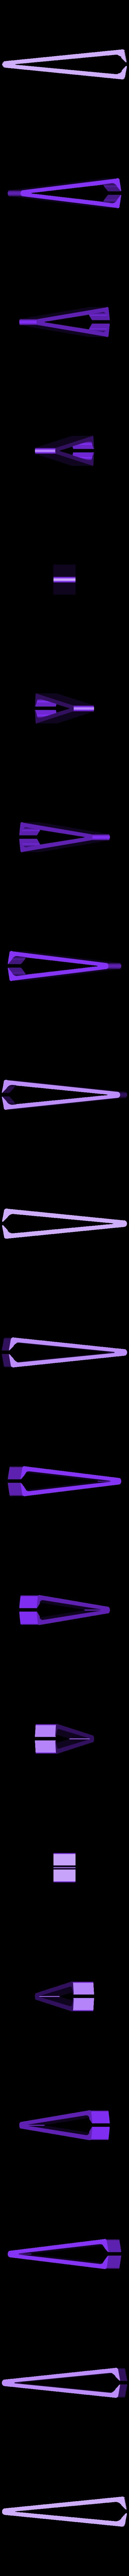 pince.stl Download free STL file pliers for removing splinters • 3D print design, YOHAN_3D